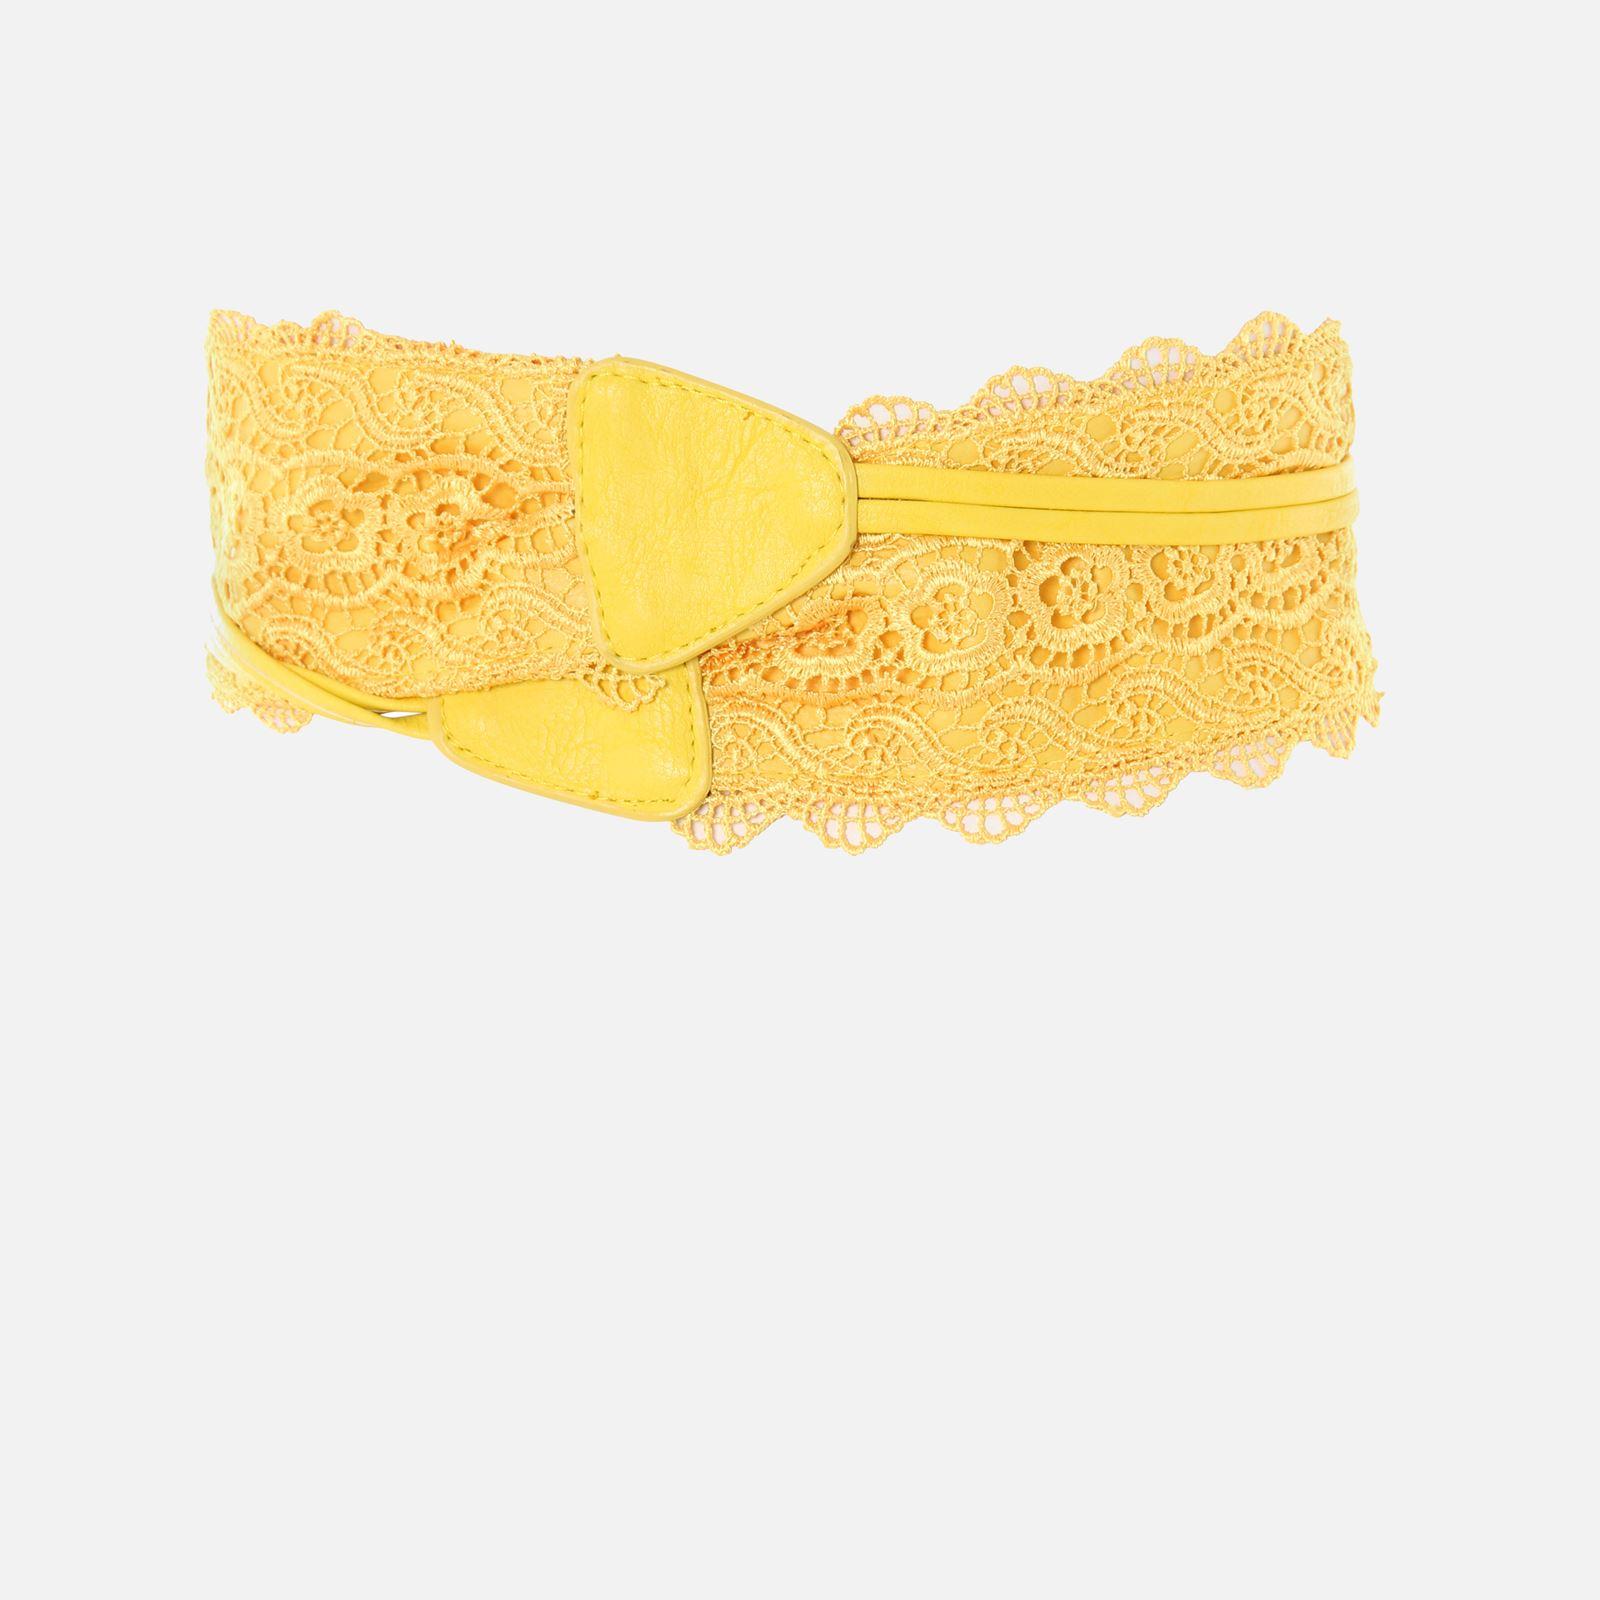 thumbnail 67 - Womens-Ladies-Wide-Waist-Belt-Floral-Waistband-Pattern-Band-Crochet-Lace-Corset